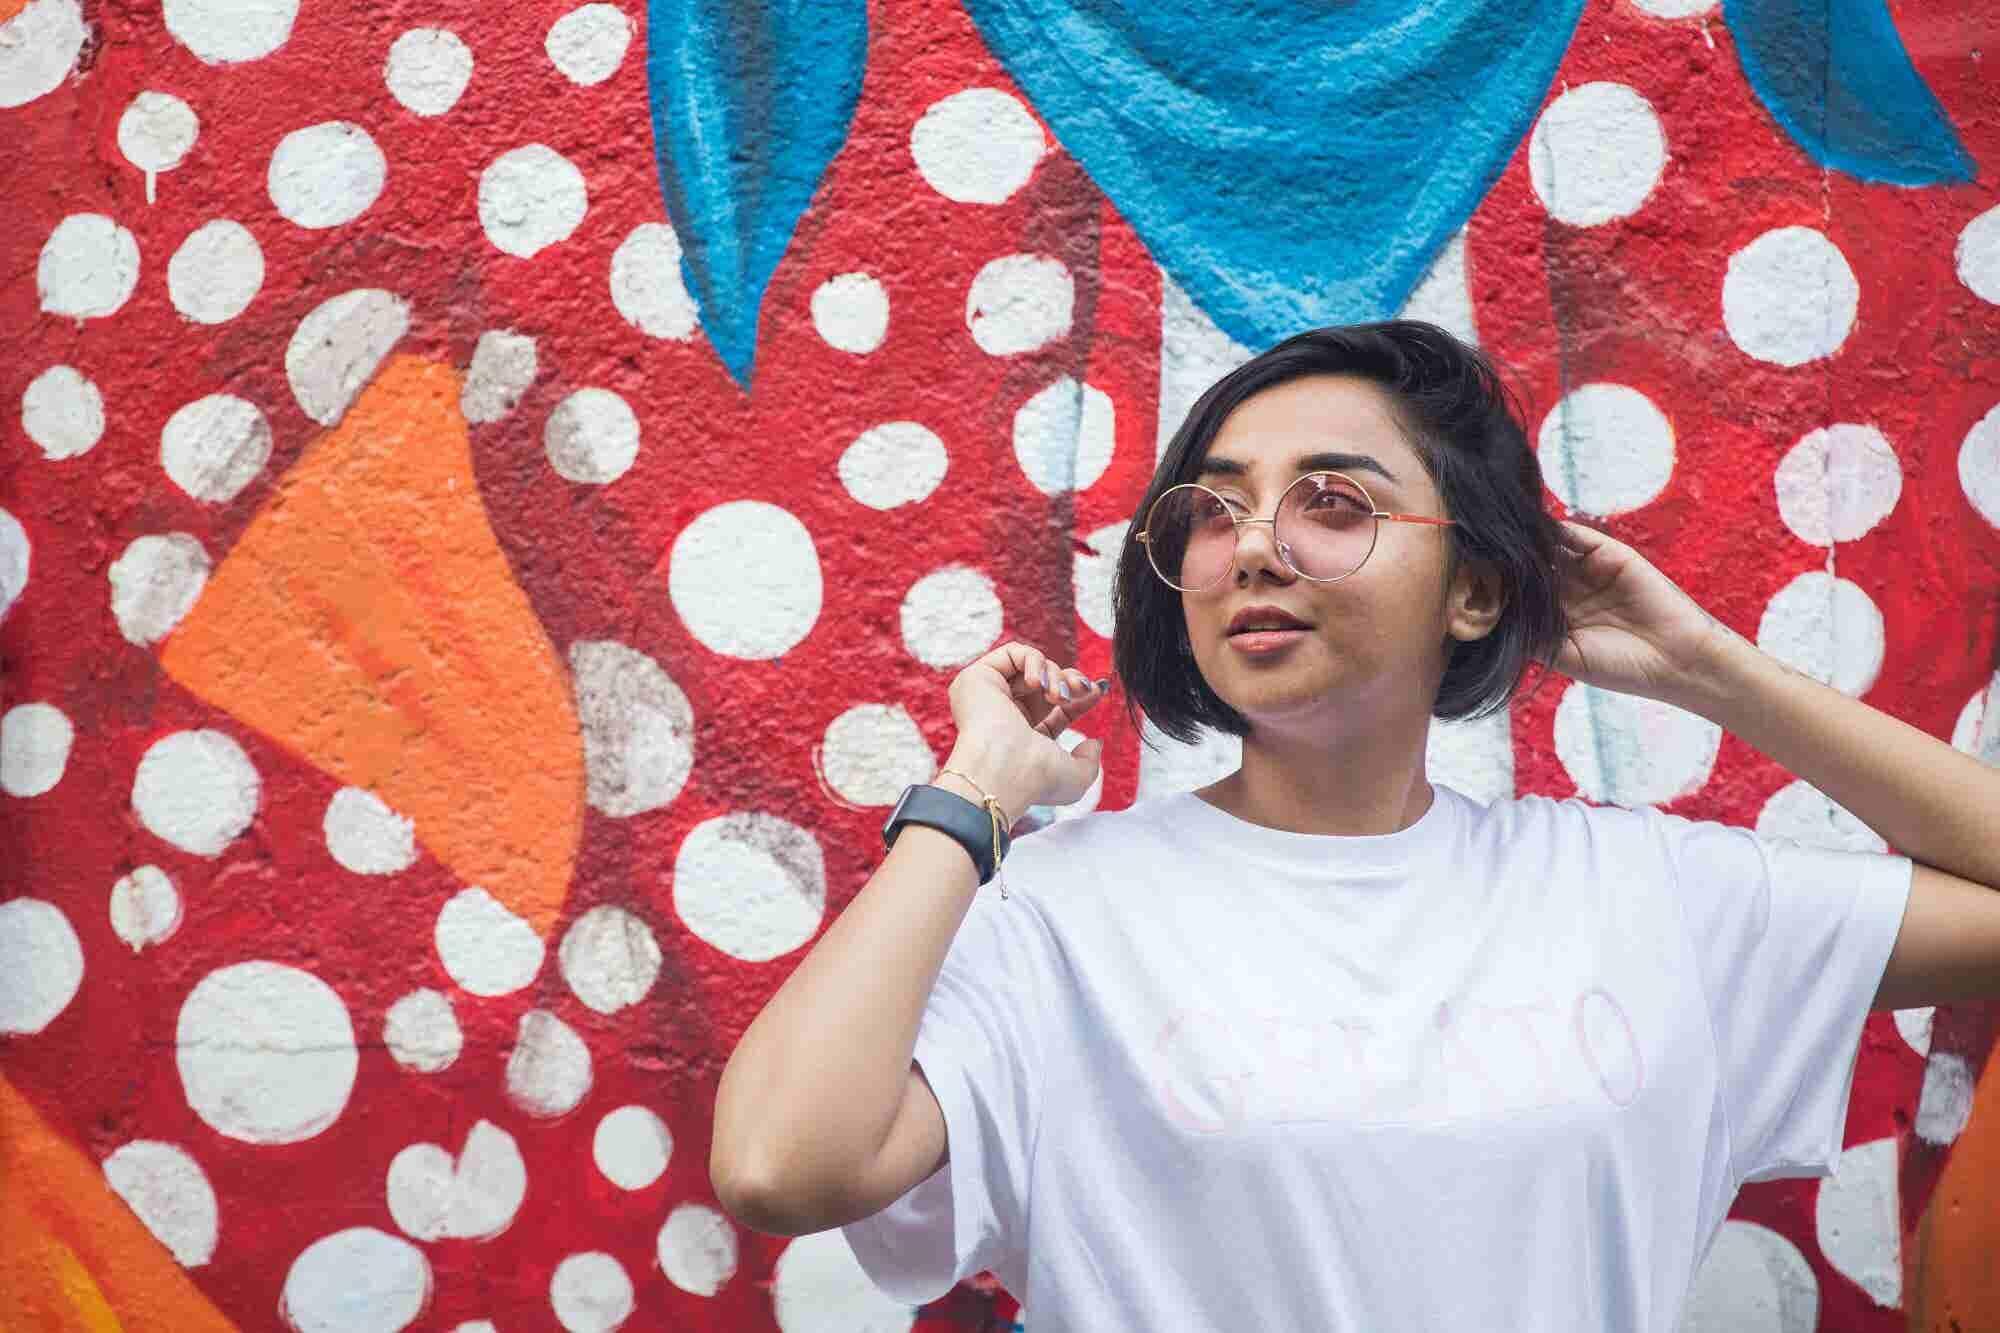 Acing the 'Sassy' Cult Got Prajakta Koli Into Entrepreneur India's 35under35 List